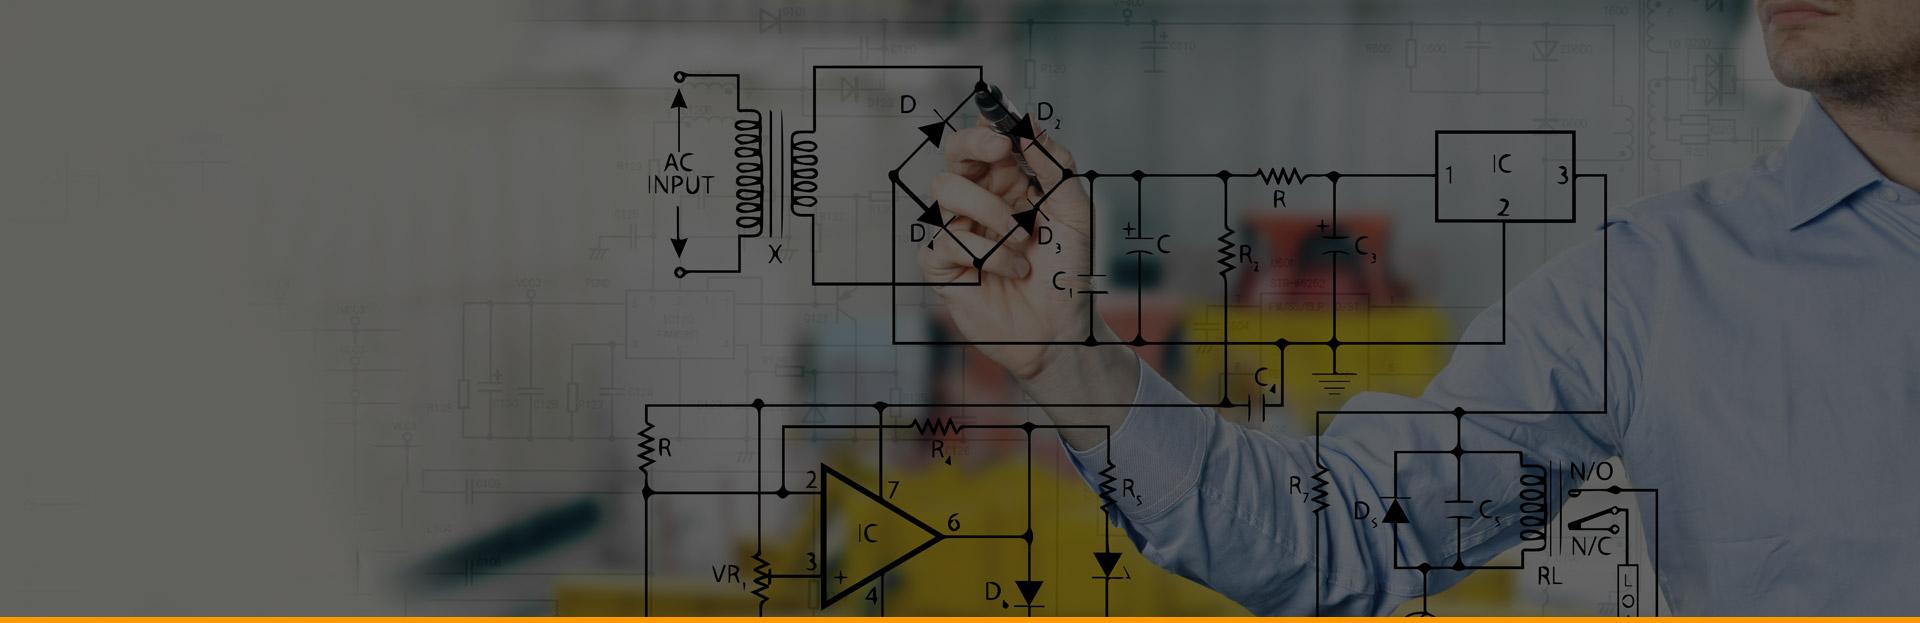 Bild Startseite Arslan Engineering Ingenieur Büro